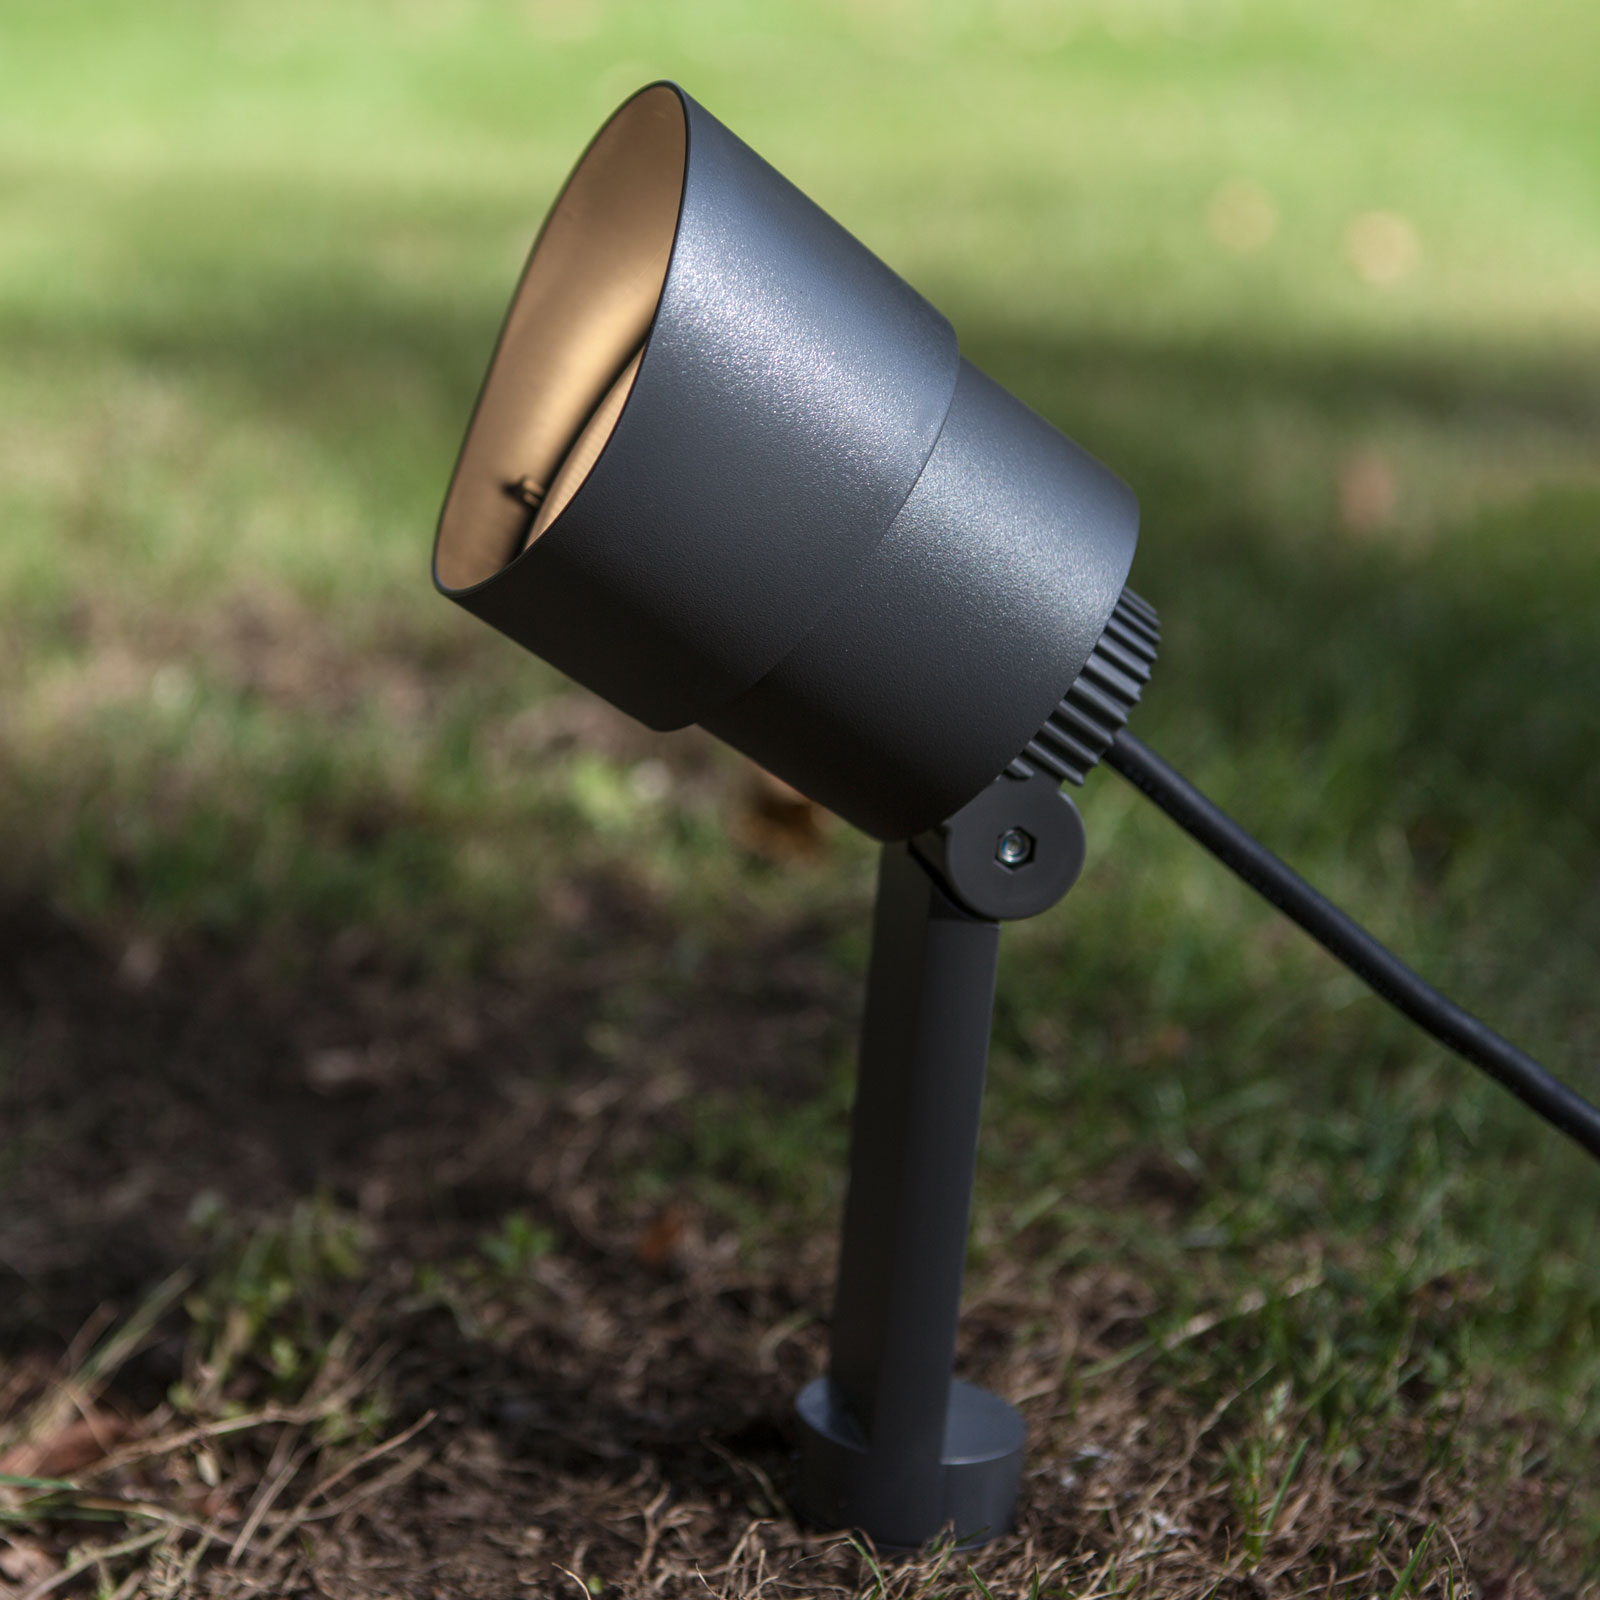 WiZ Explorer LED-lampe med jordspyd